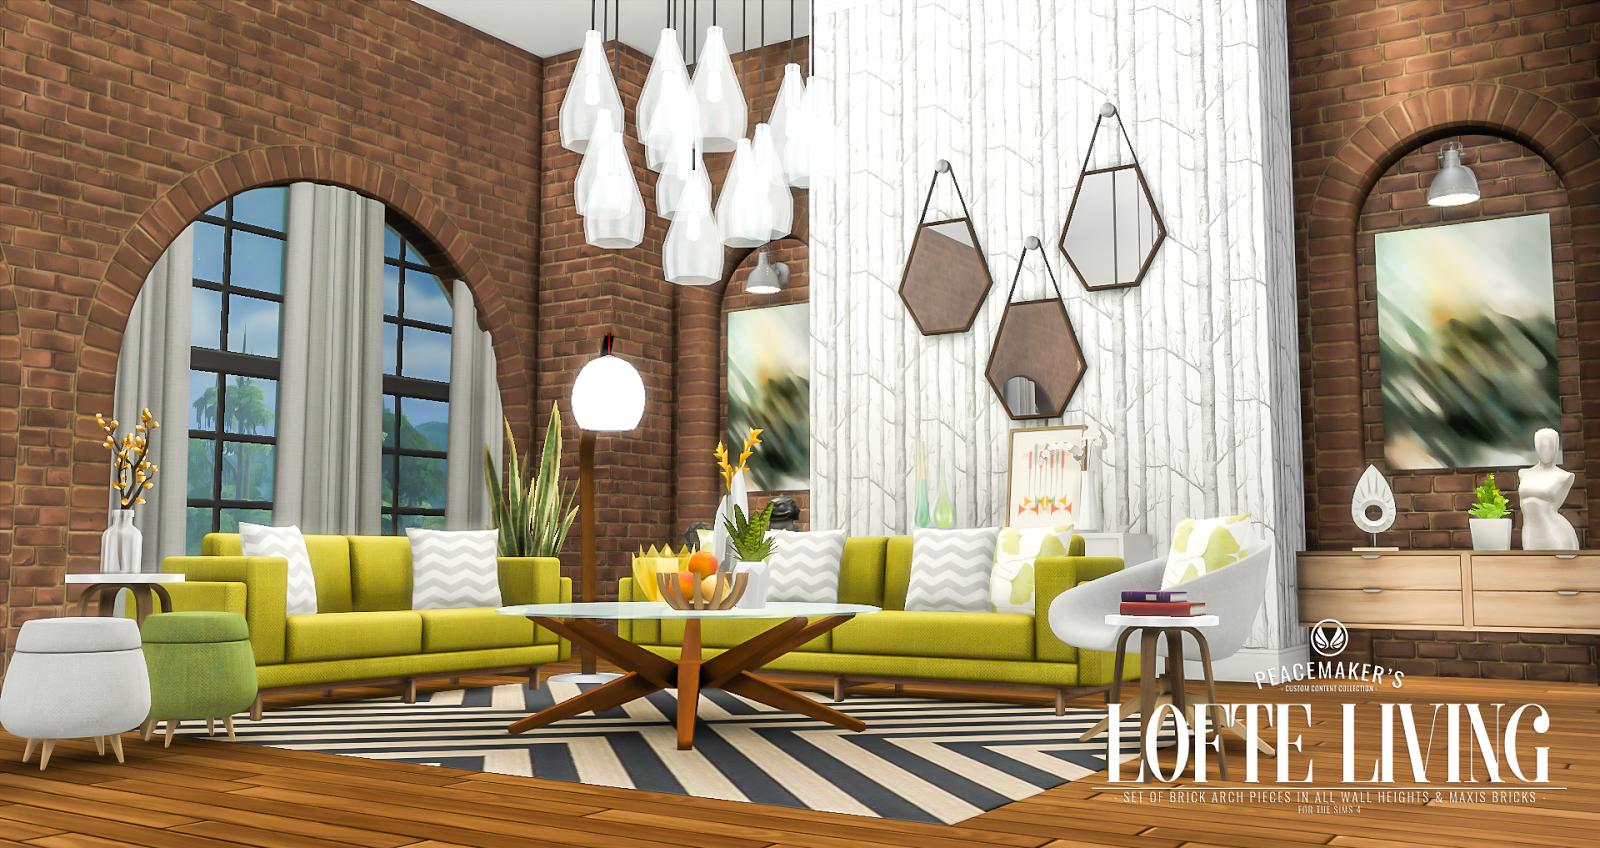 Simsational Designs: Lofte Living - Brick Arch Decor Set